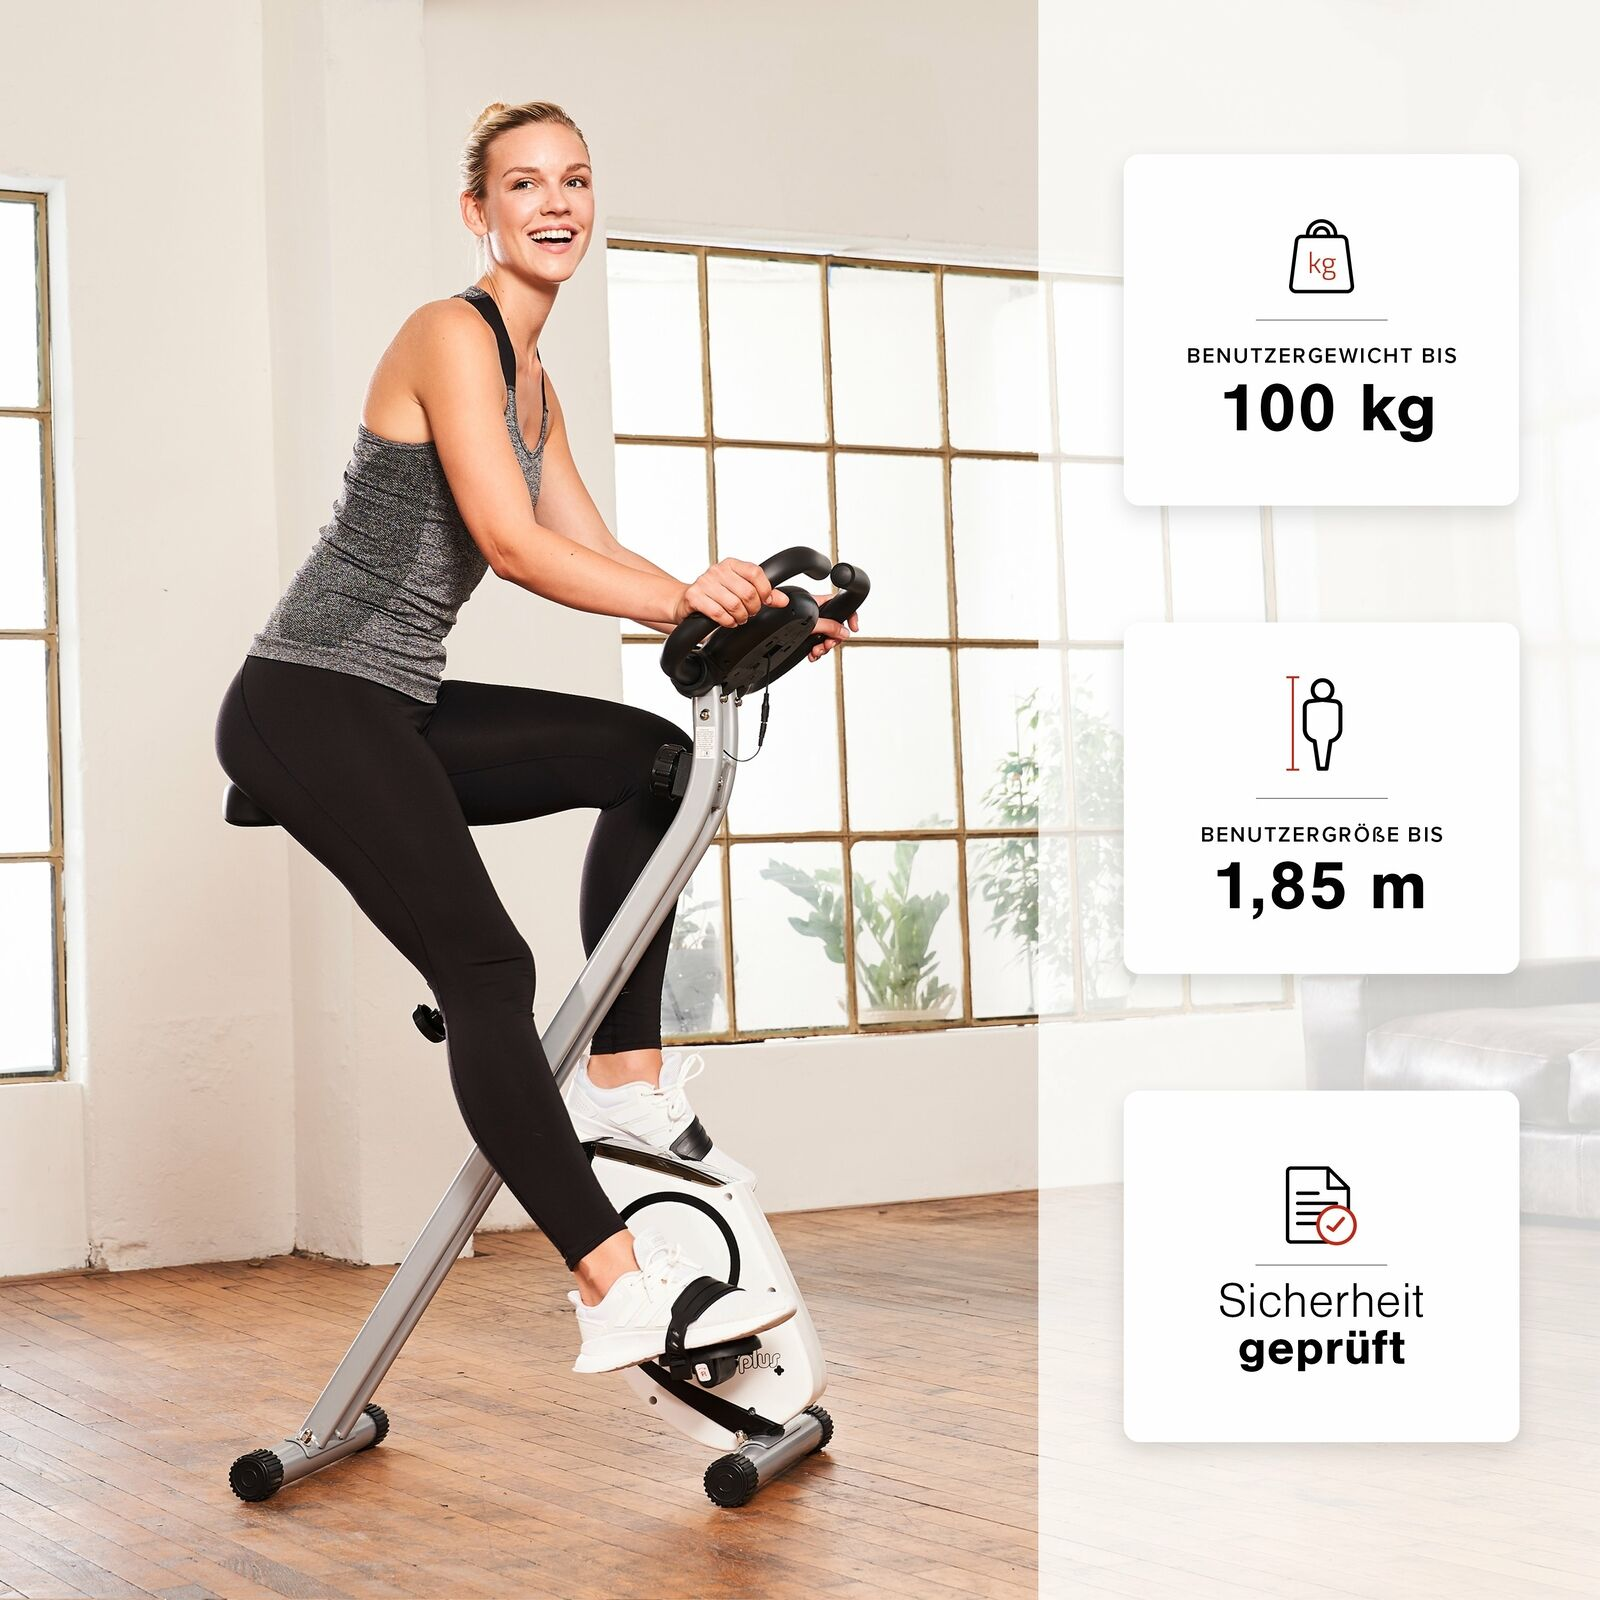 SportPlus X-Bike Hometrainer Fitnessbike Fahrrad Trimmrad Heimtrainer klappbar